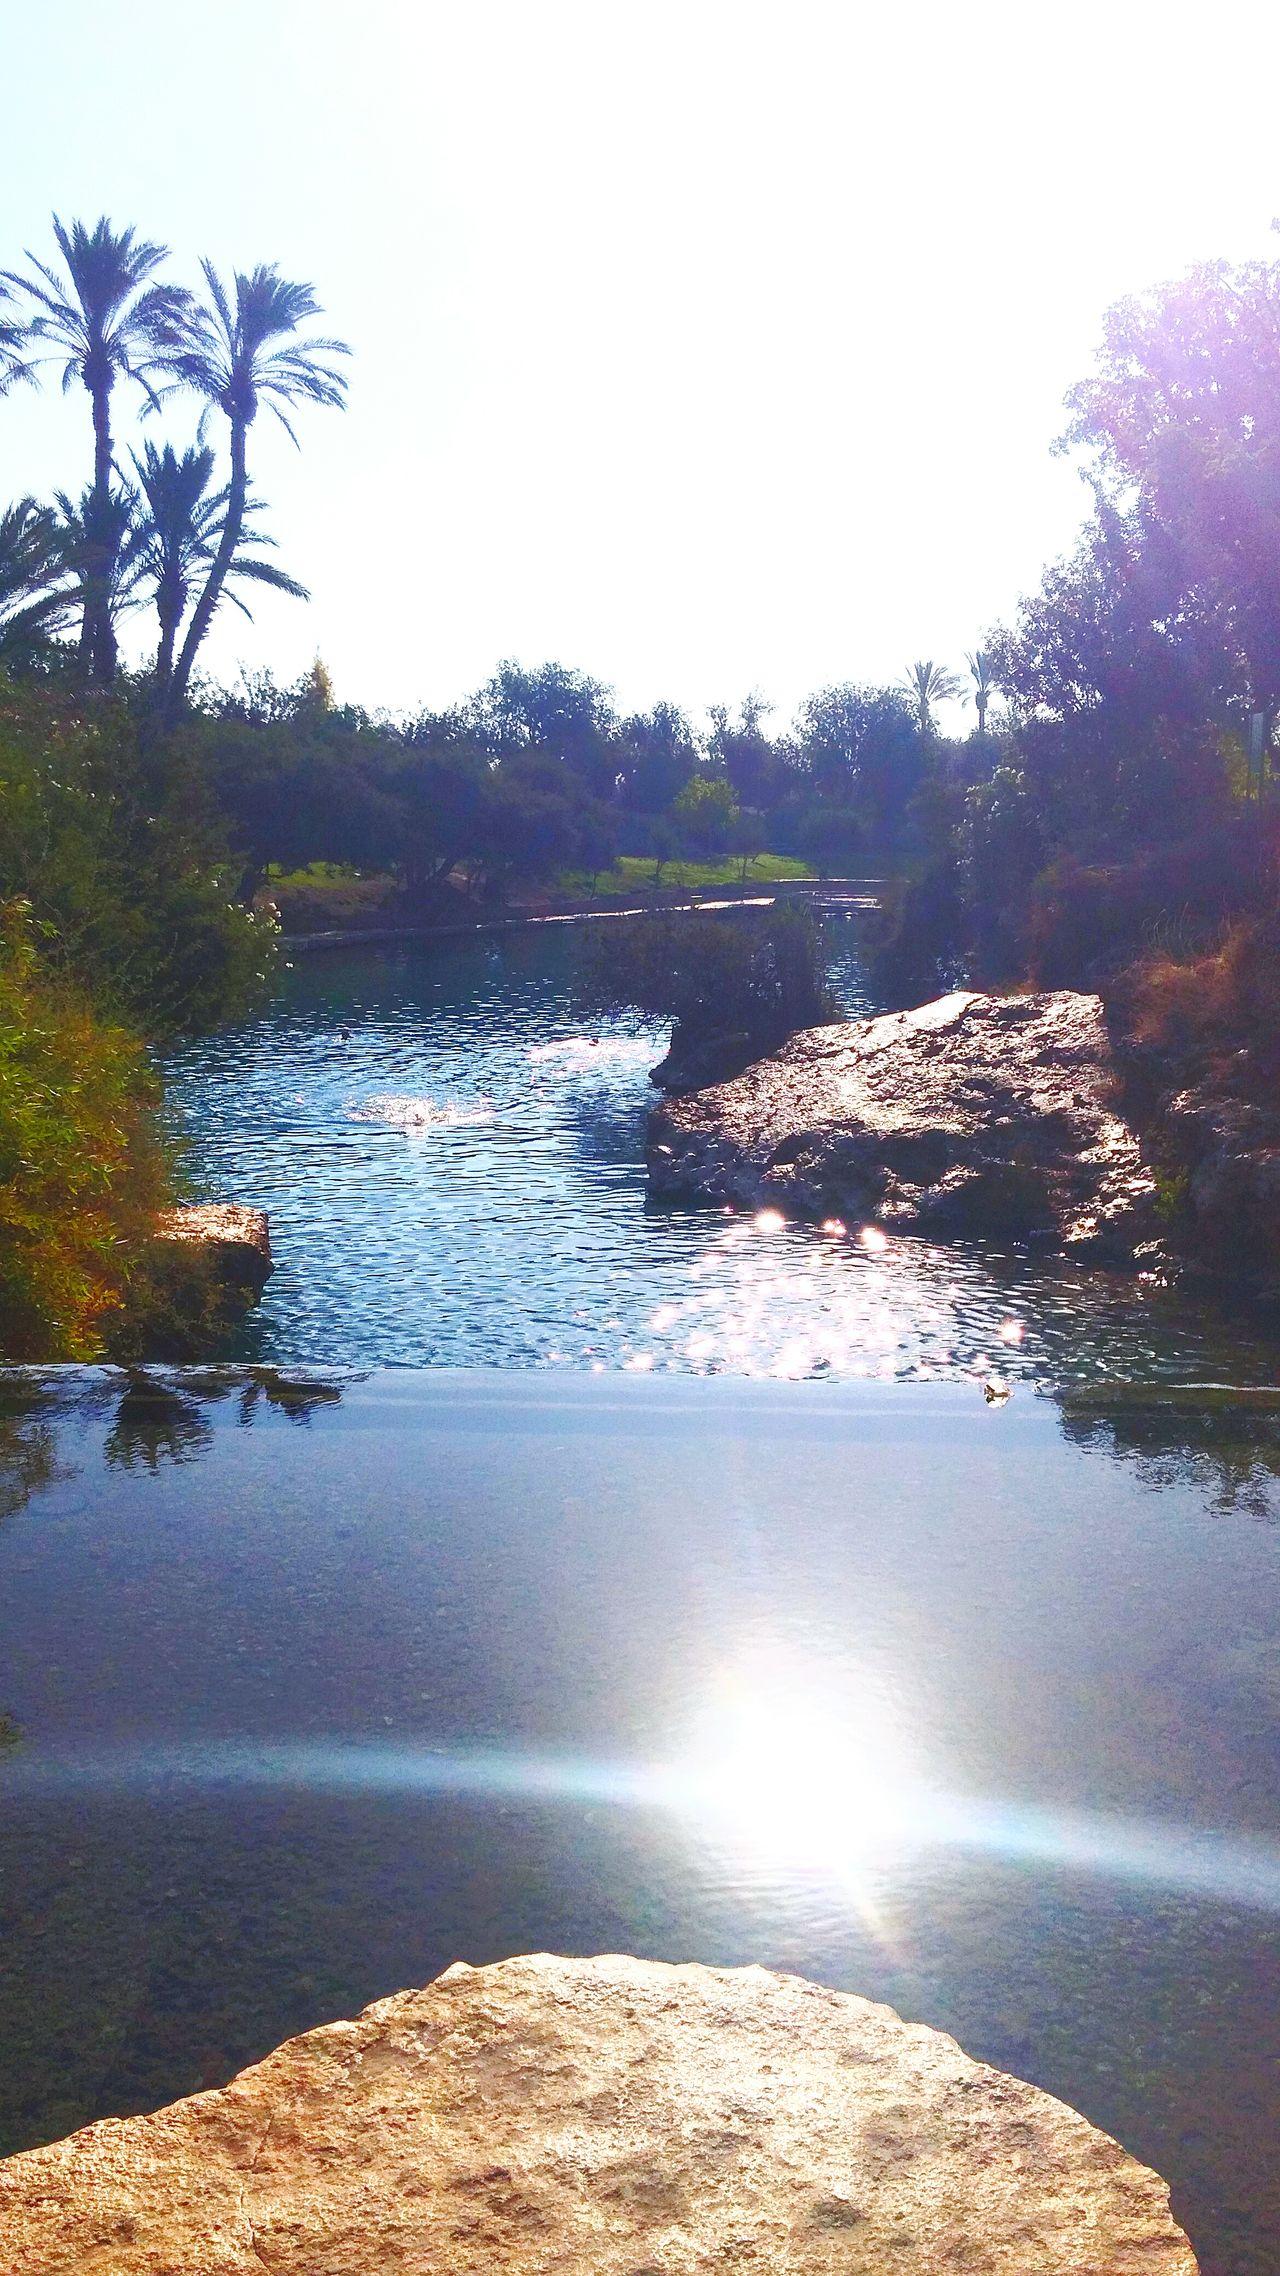 Nature Water Summer Springs גן השלושה بيسان الساخنة